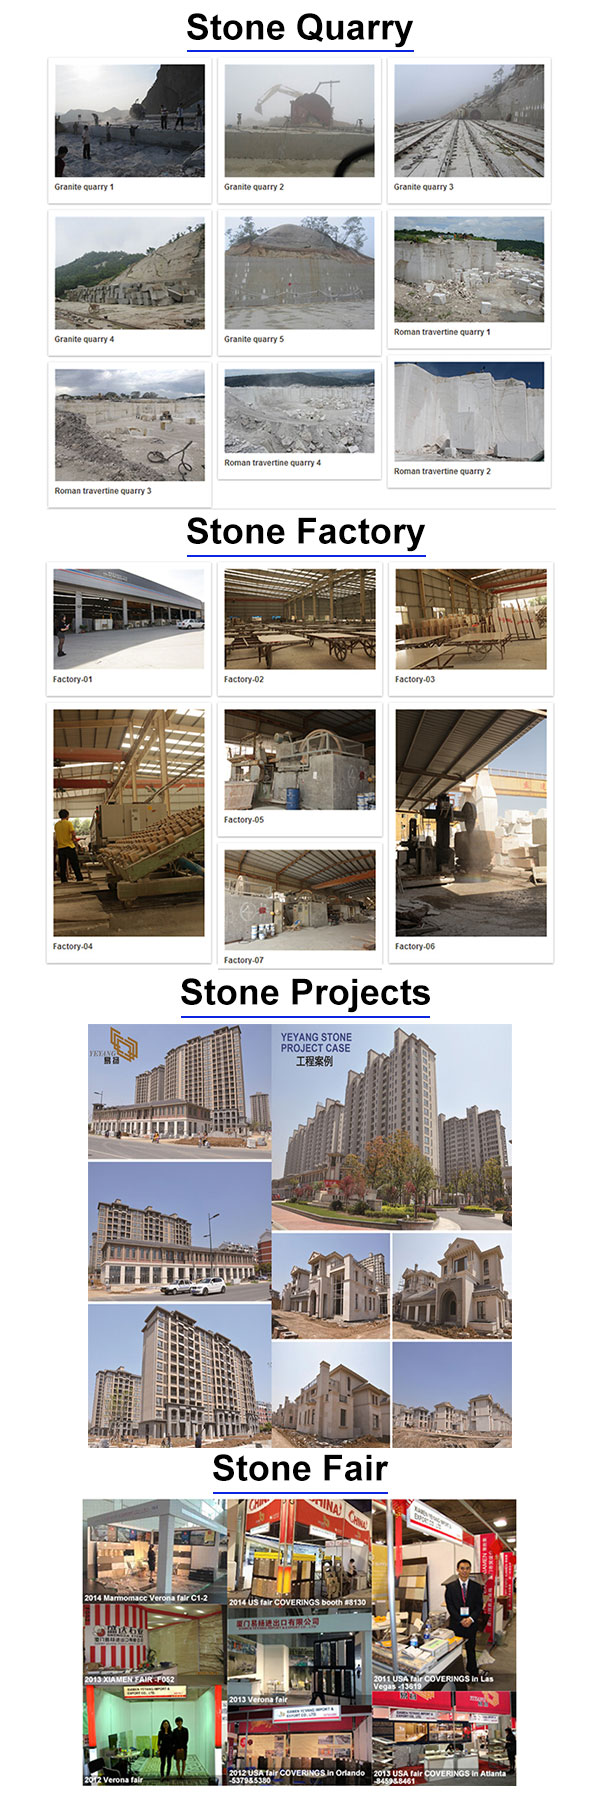 Quarry+factory+project+fair.jpg